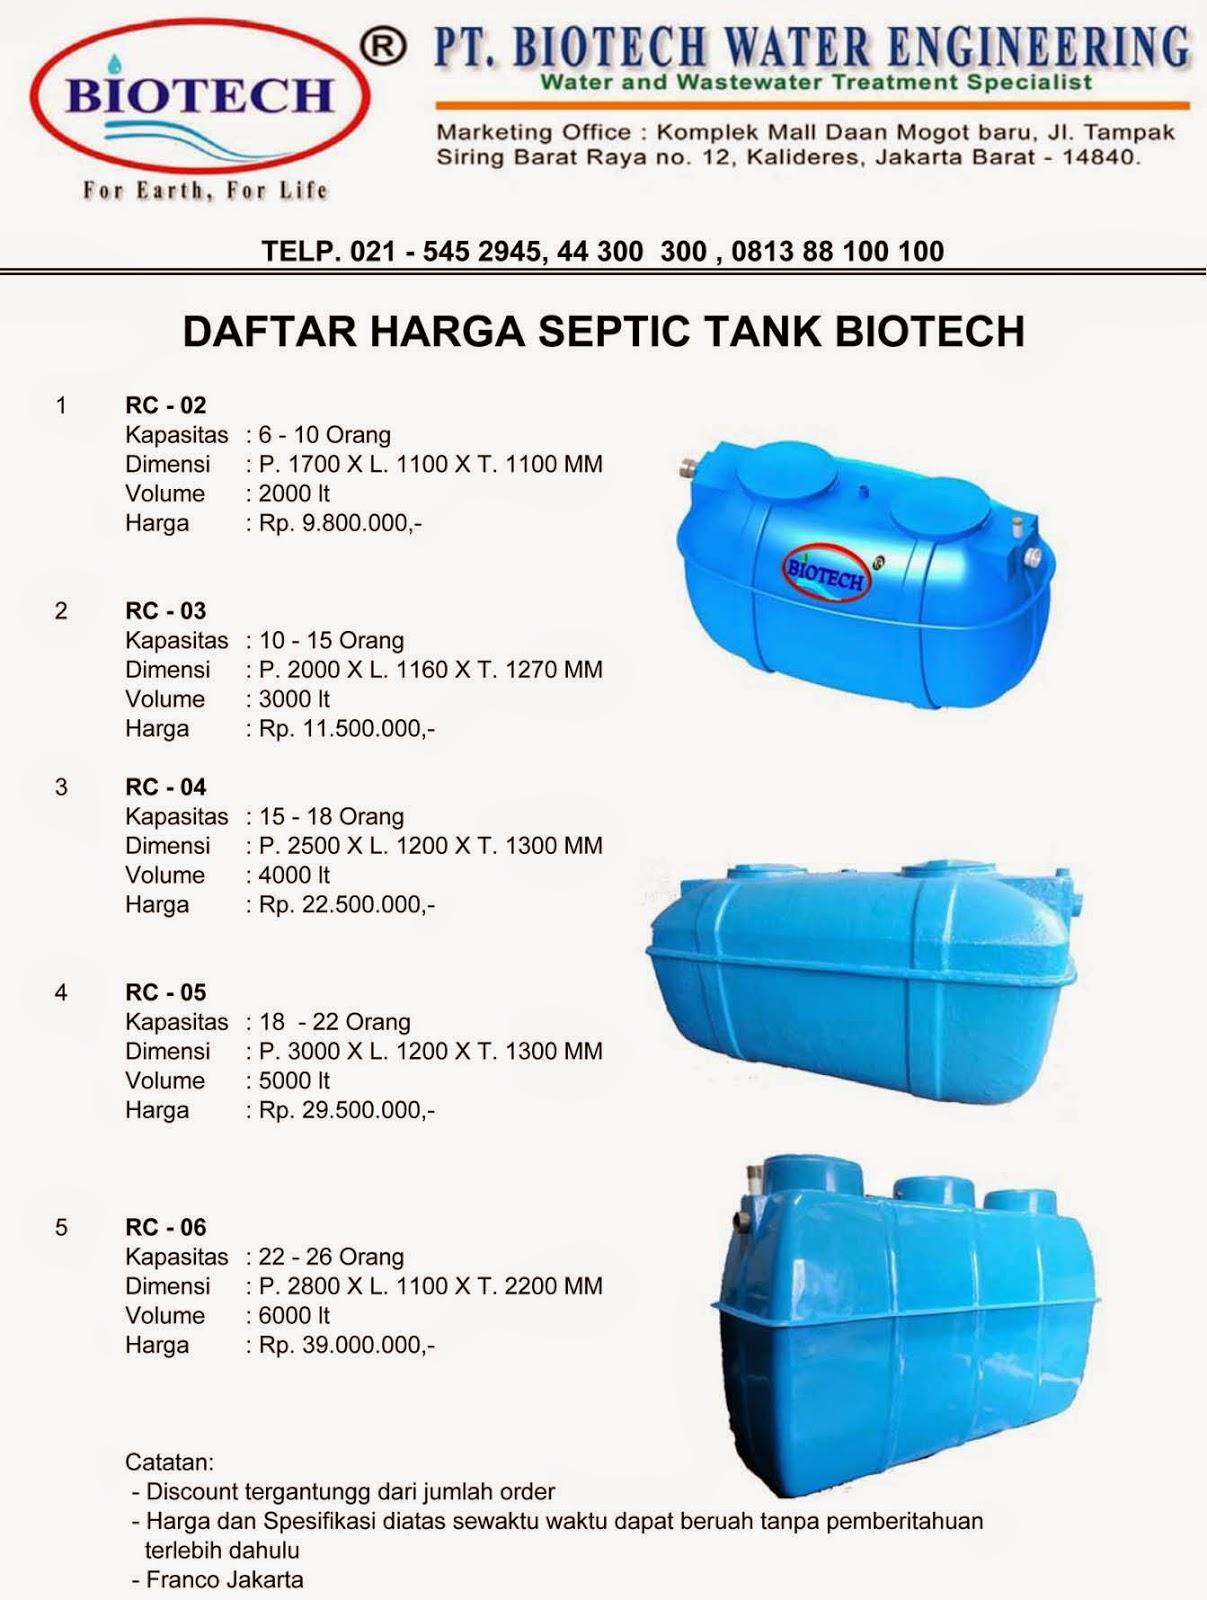 daftar harga septic tank biotech, price list, induro, fibertech, biofil, biogift, biofive